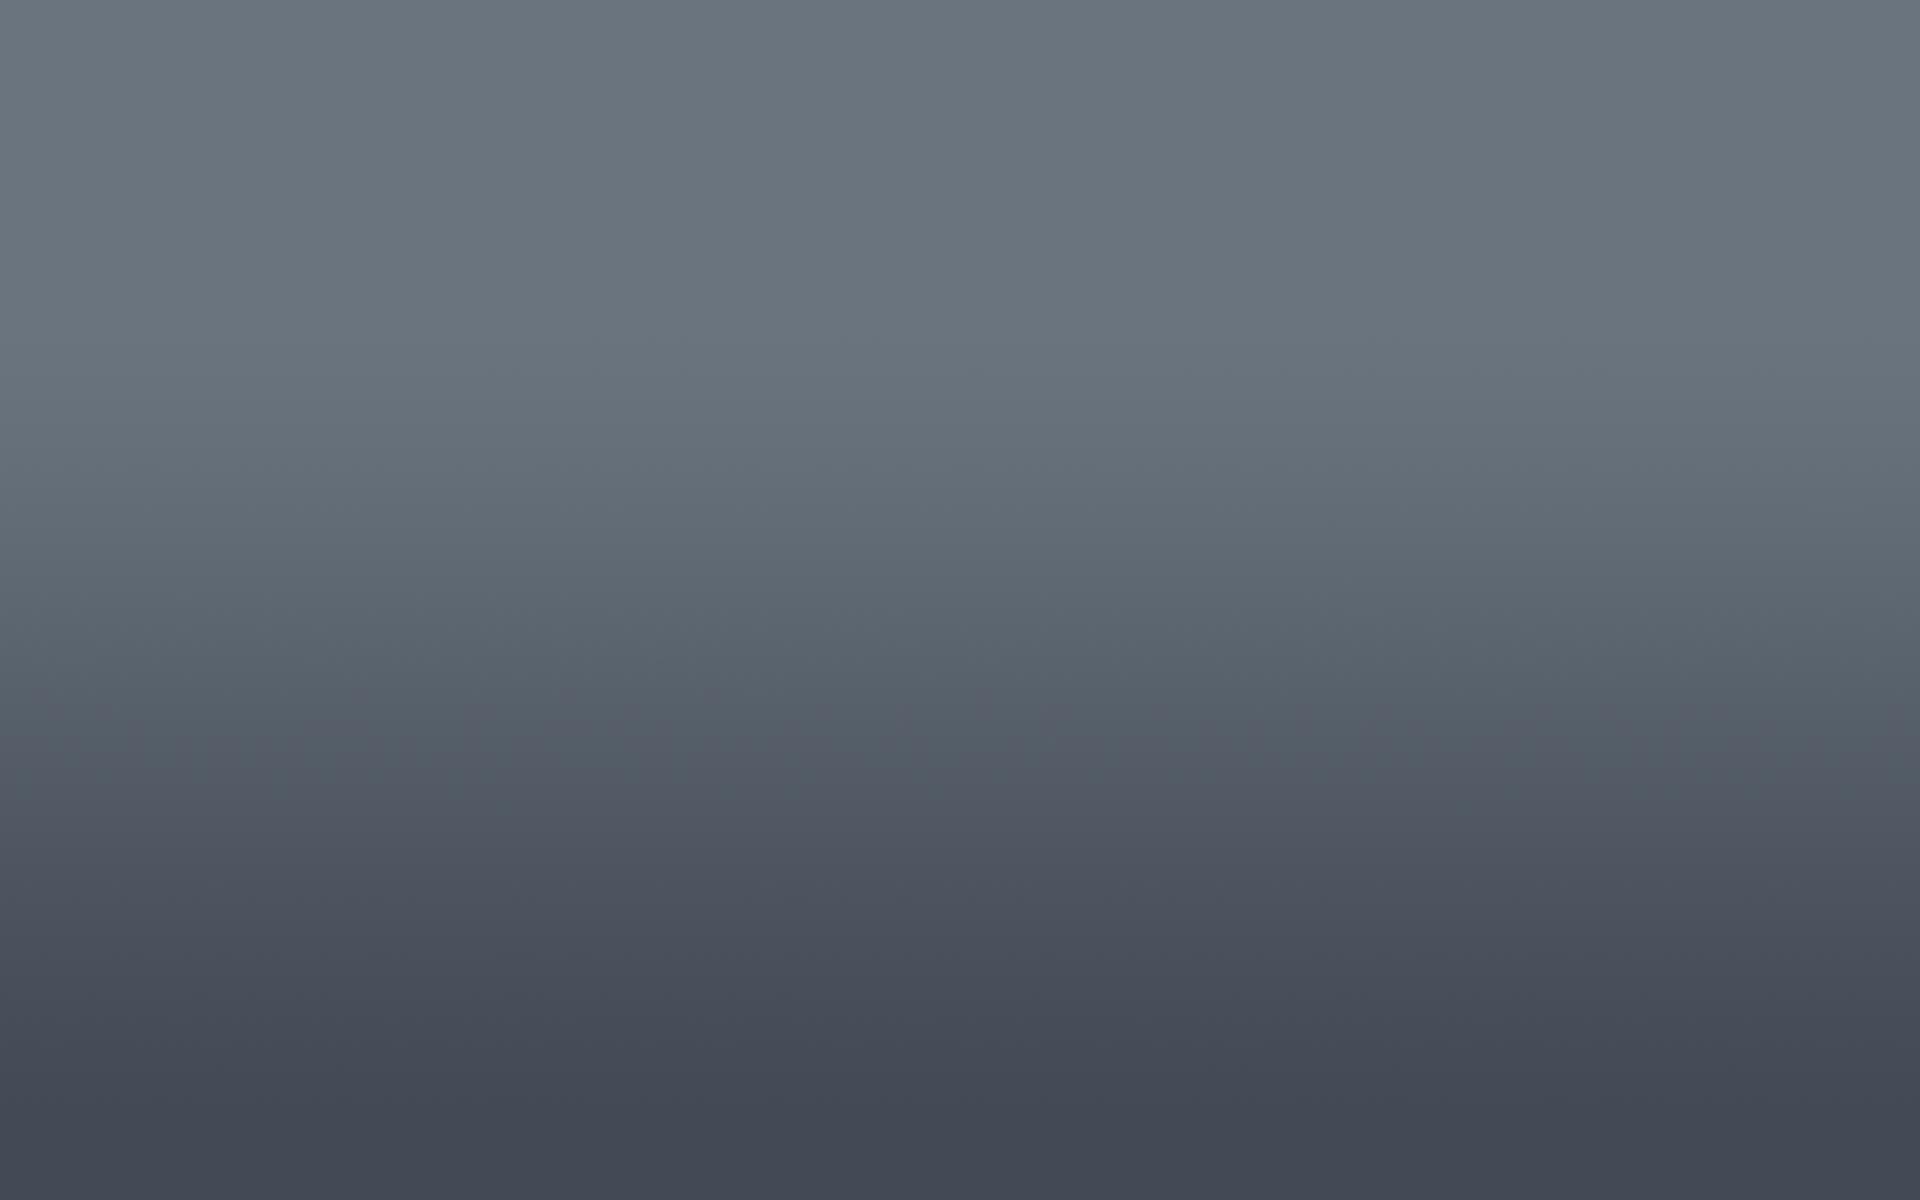 Background image gradient css - Grey Css Css Grey Gradient Background